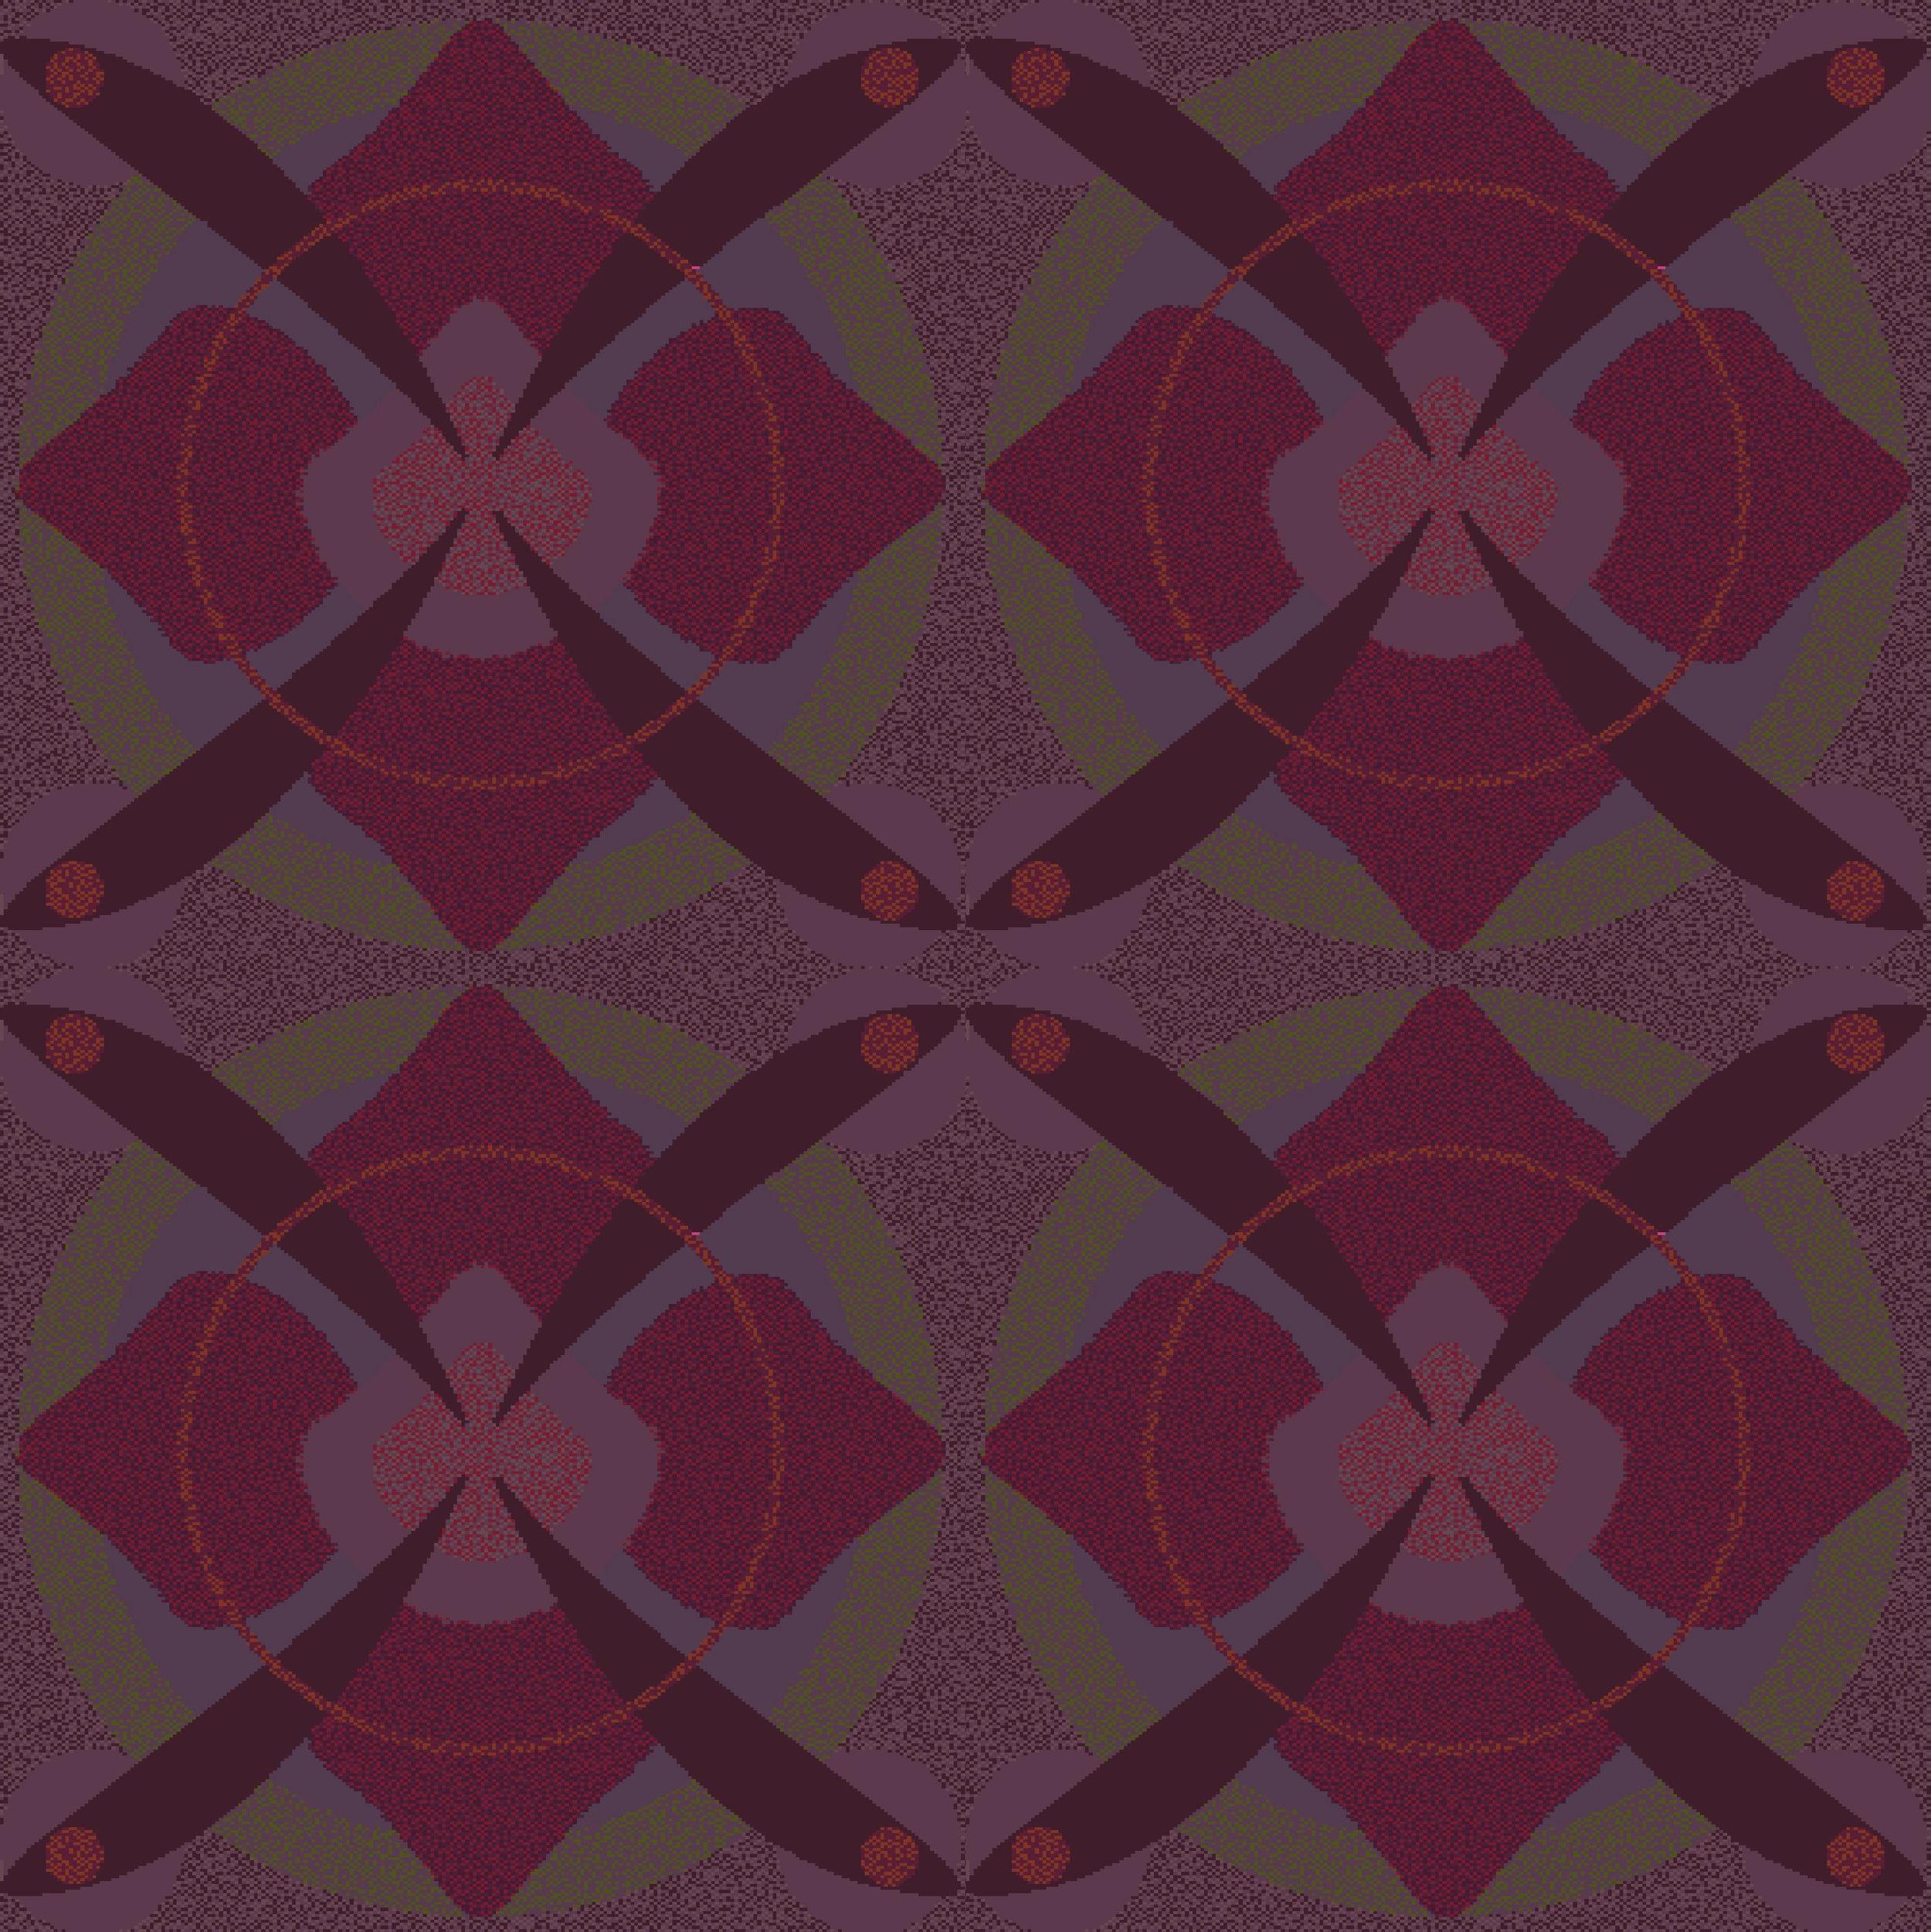 SS rug 10 ax.jpg